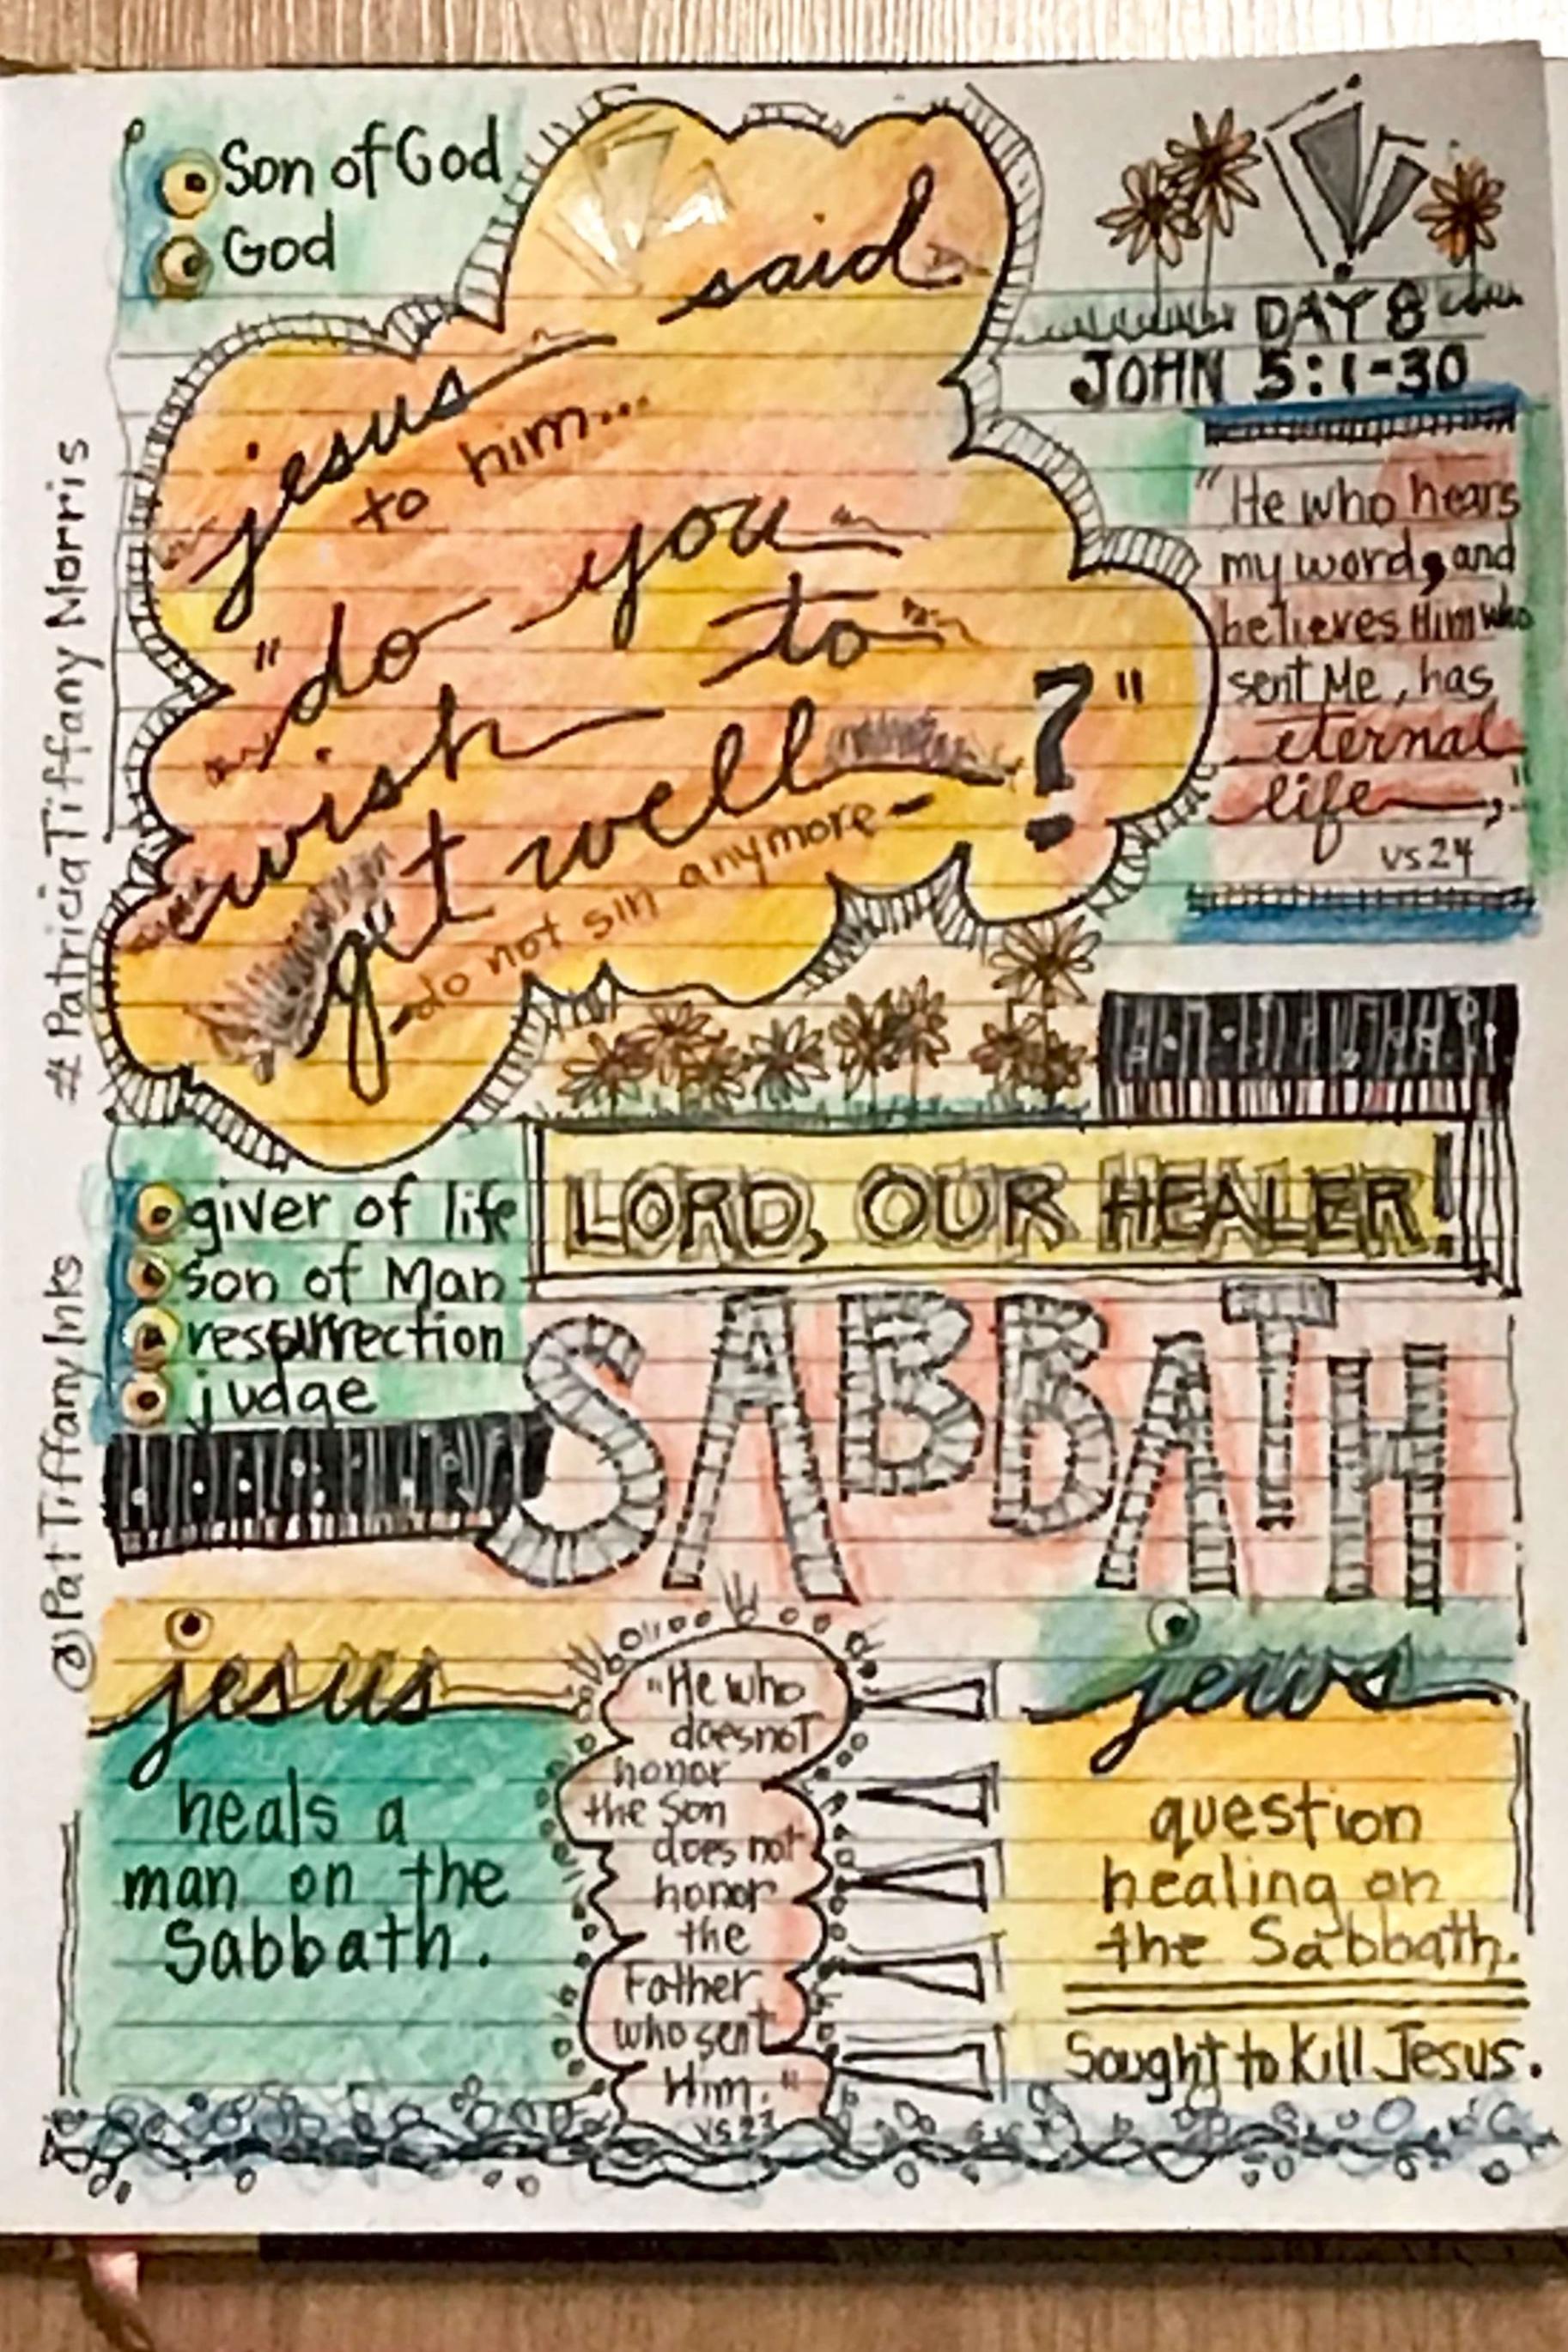 Gospel of John CH 5 1-30 Day 8 Challenge by Patricia Tiffany Morris